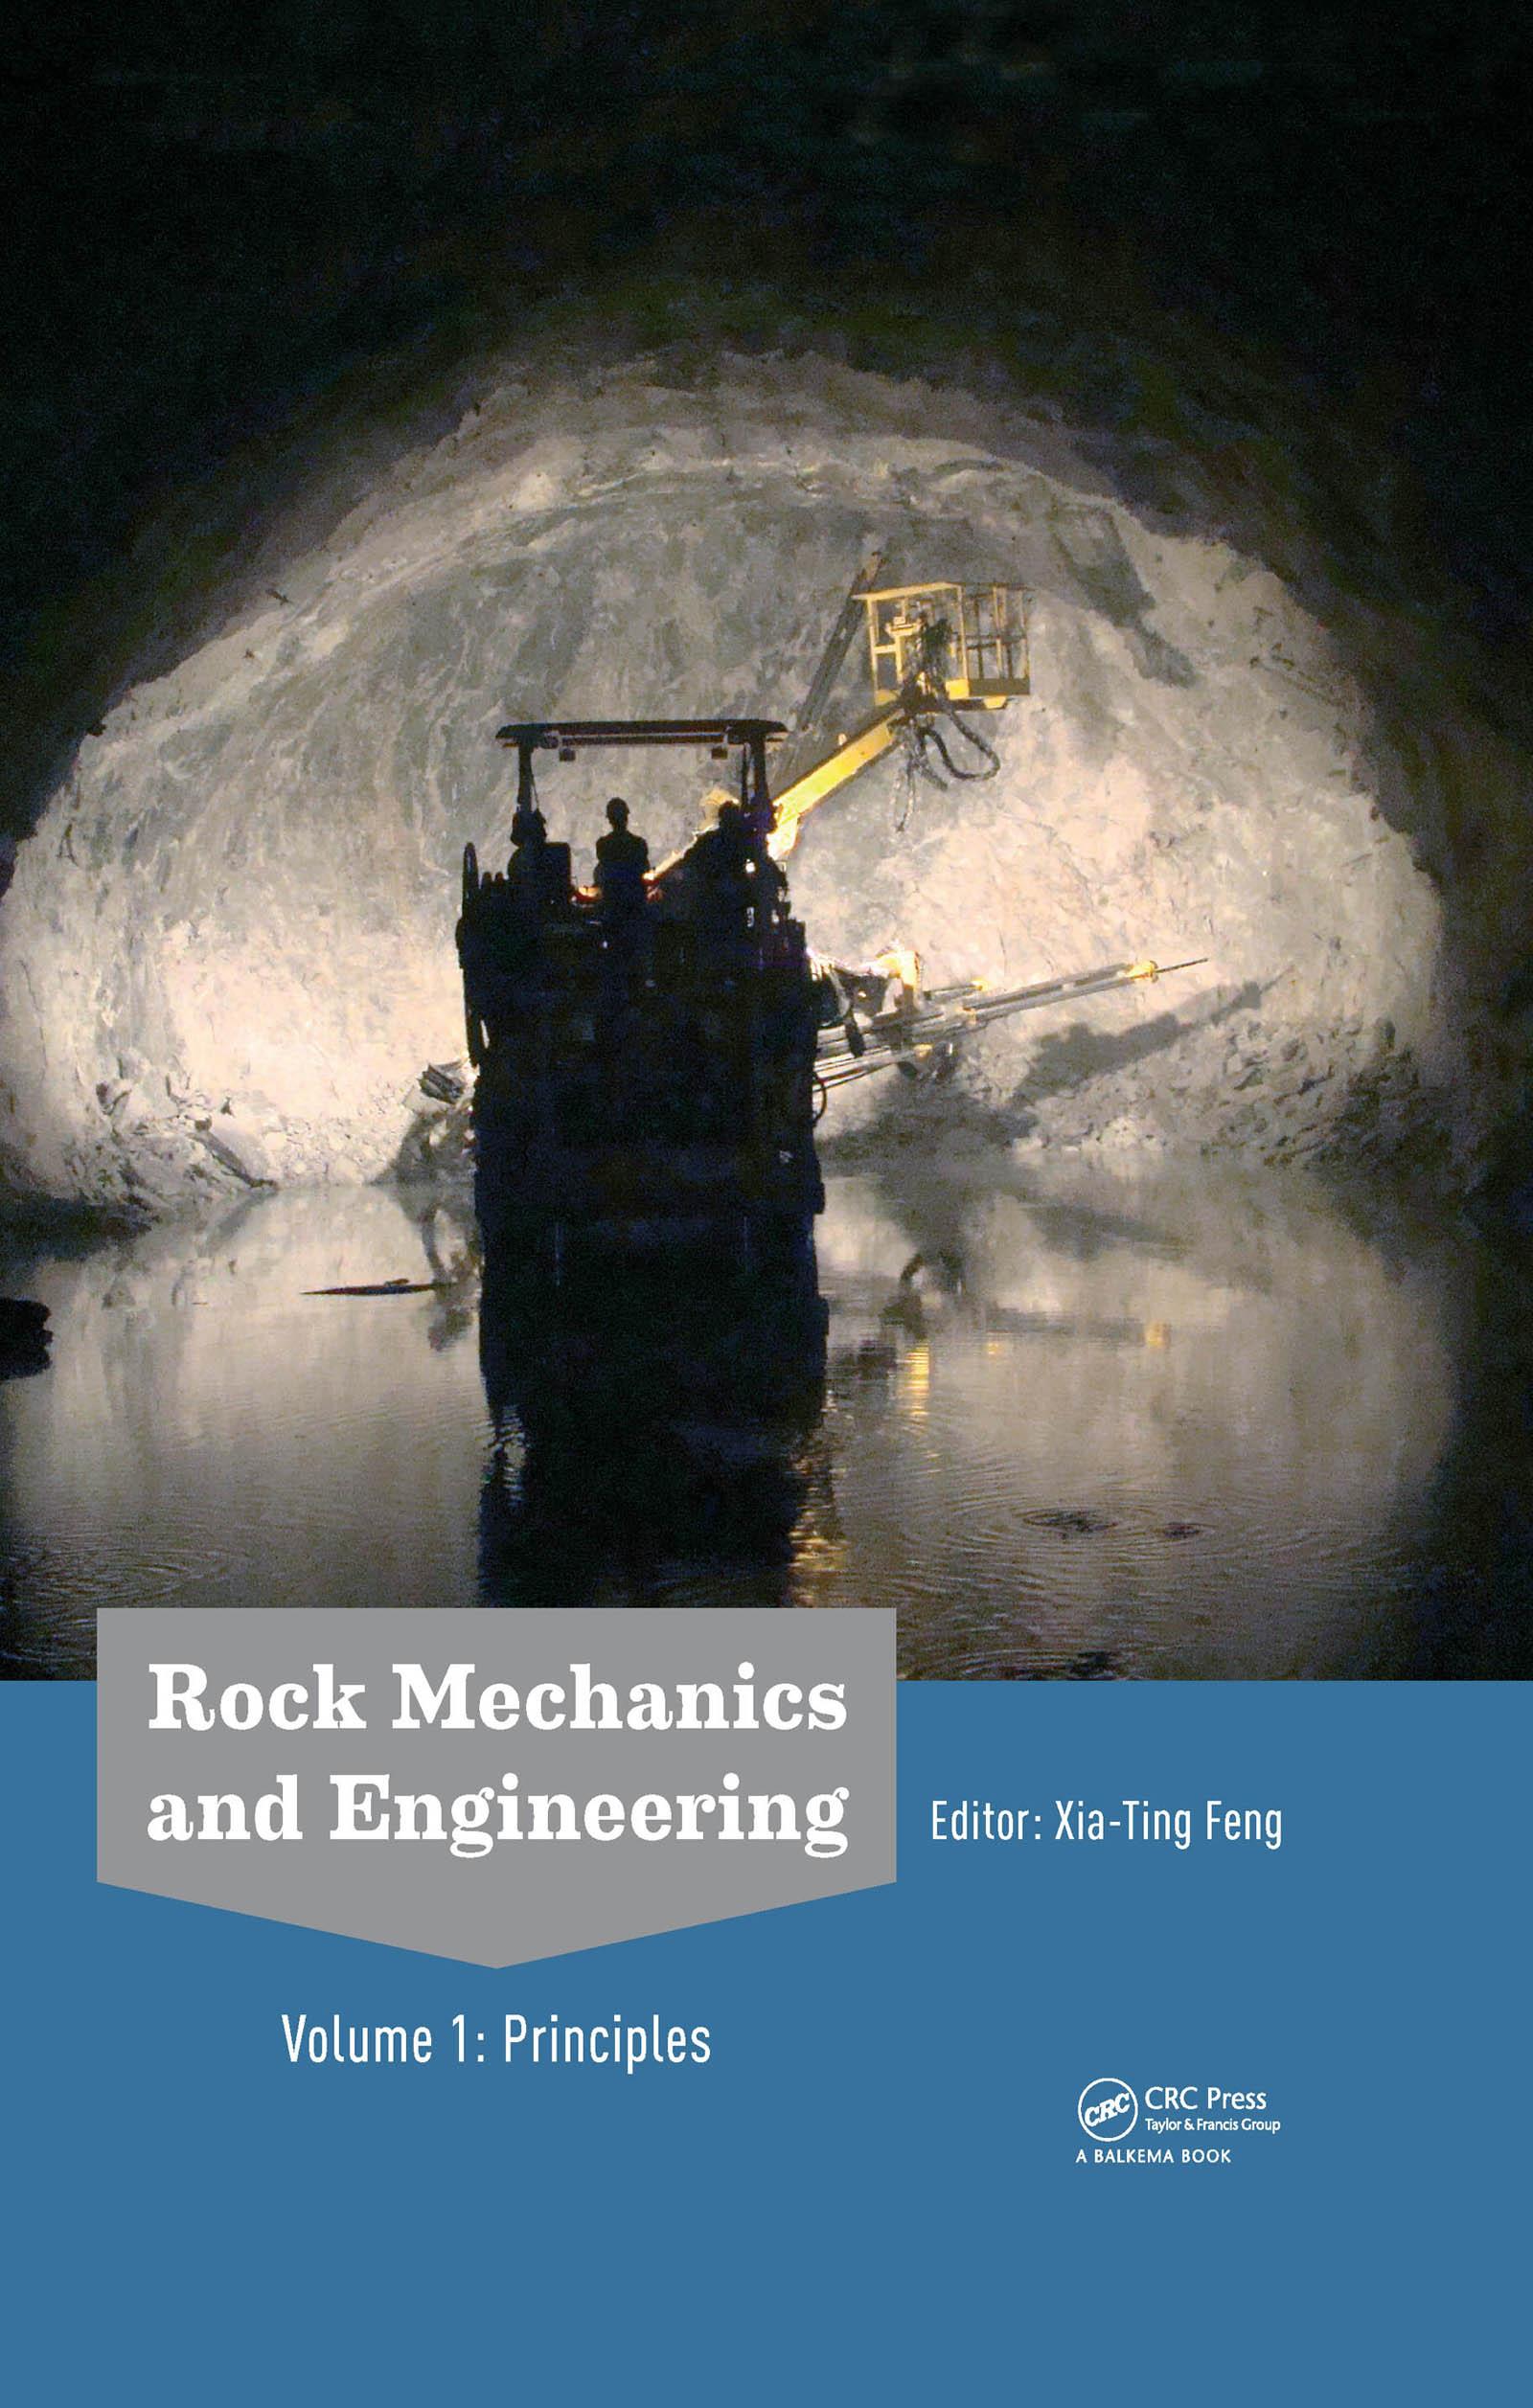 Rock Mechanics and Engineering Volume 1: Principles book cover